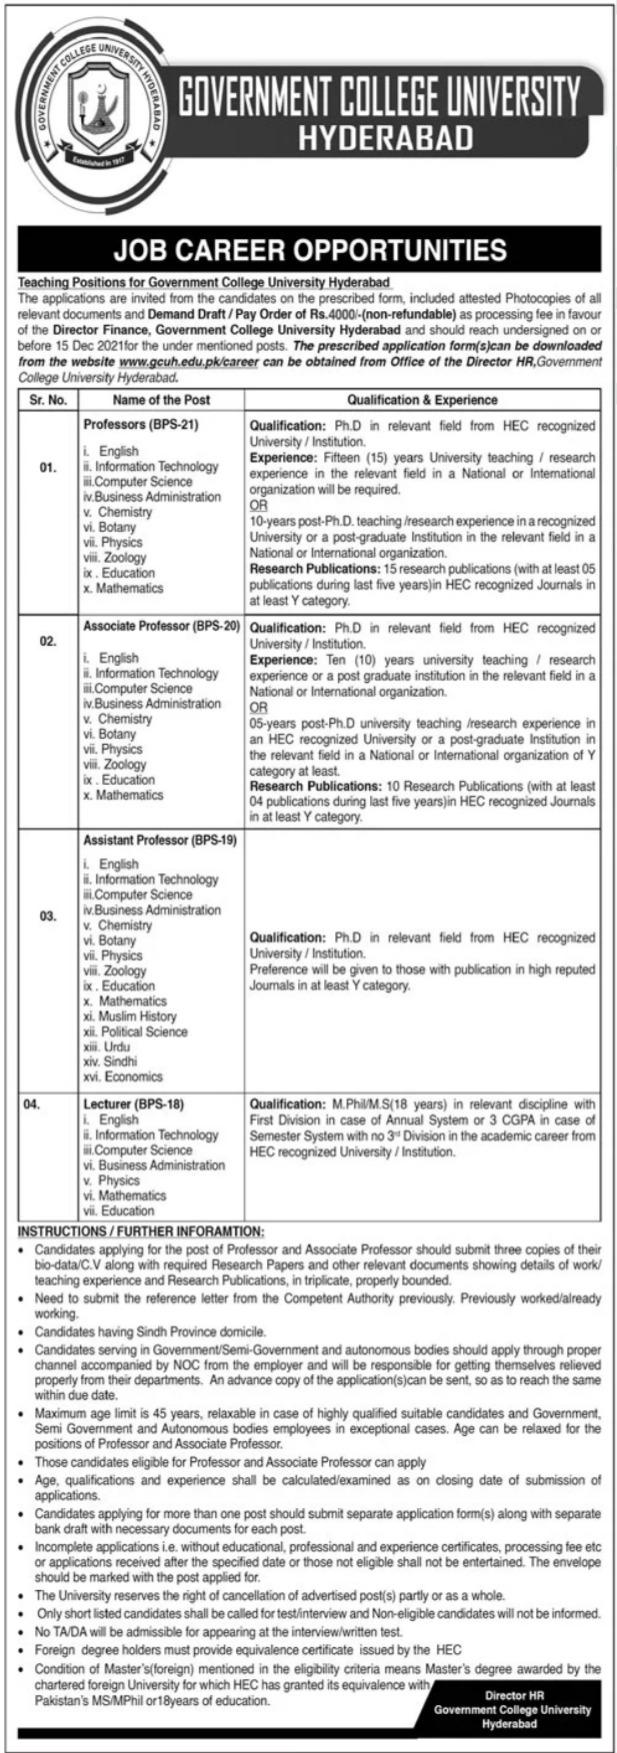 Government College University Hyderabad GCUH Jobs 2021